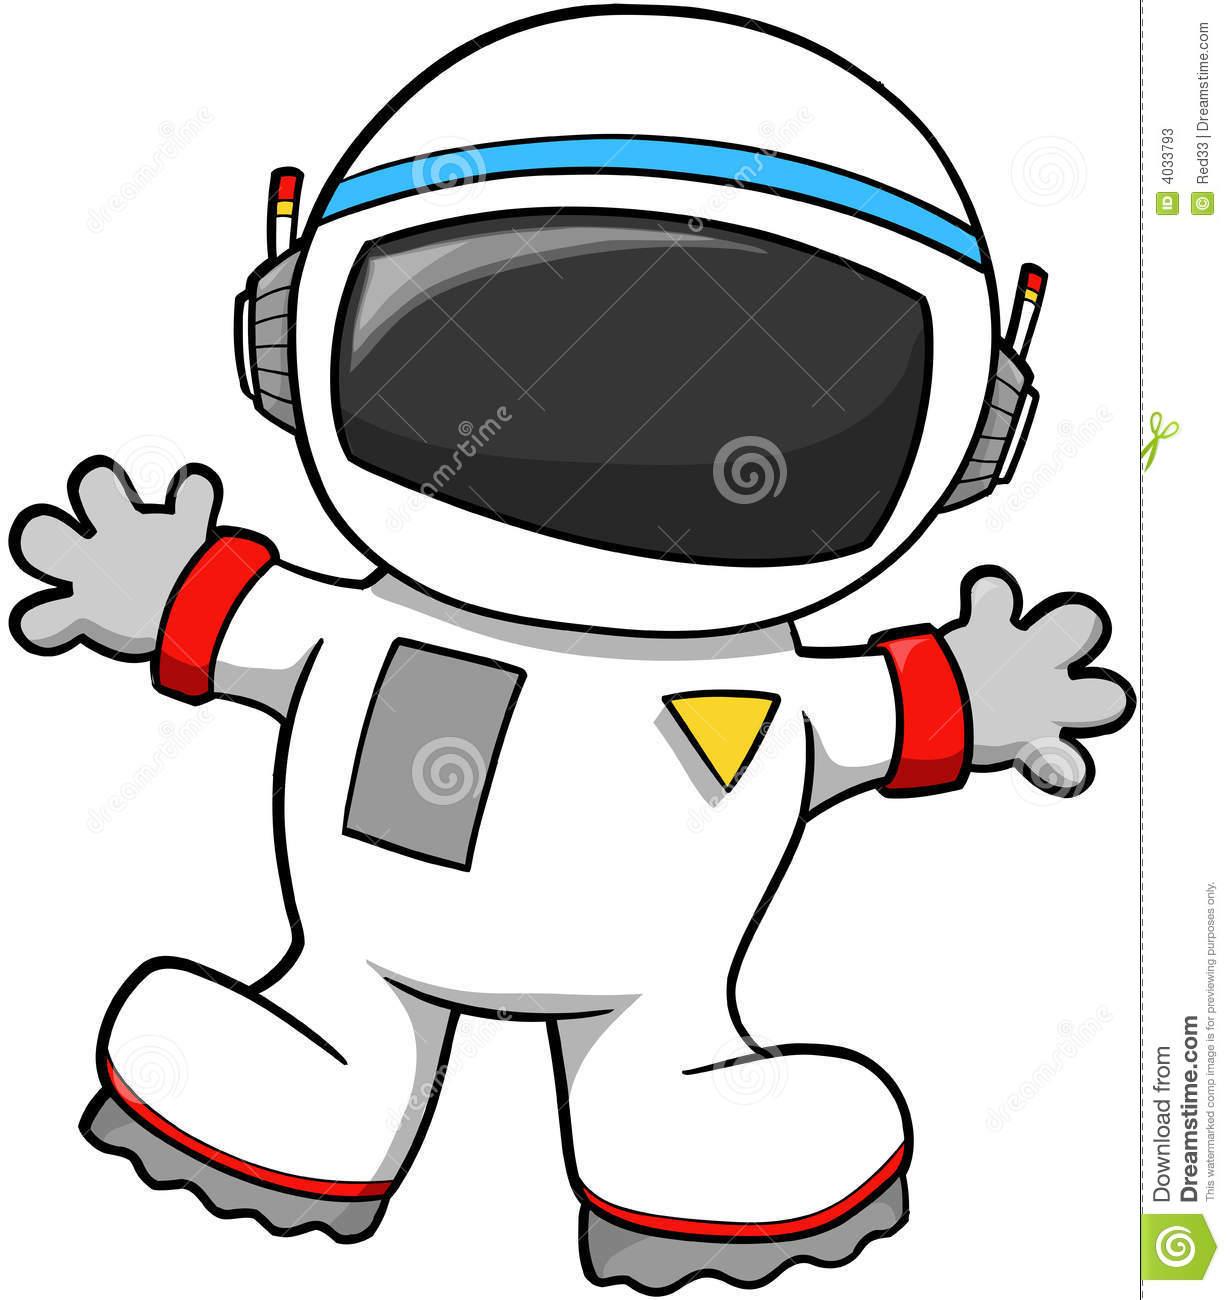 Free download best on. Astronaut clipart line art